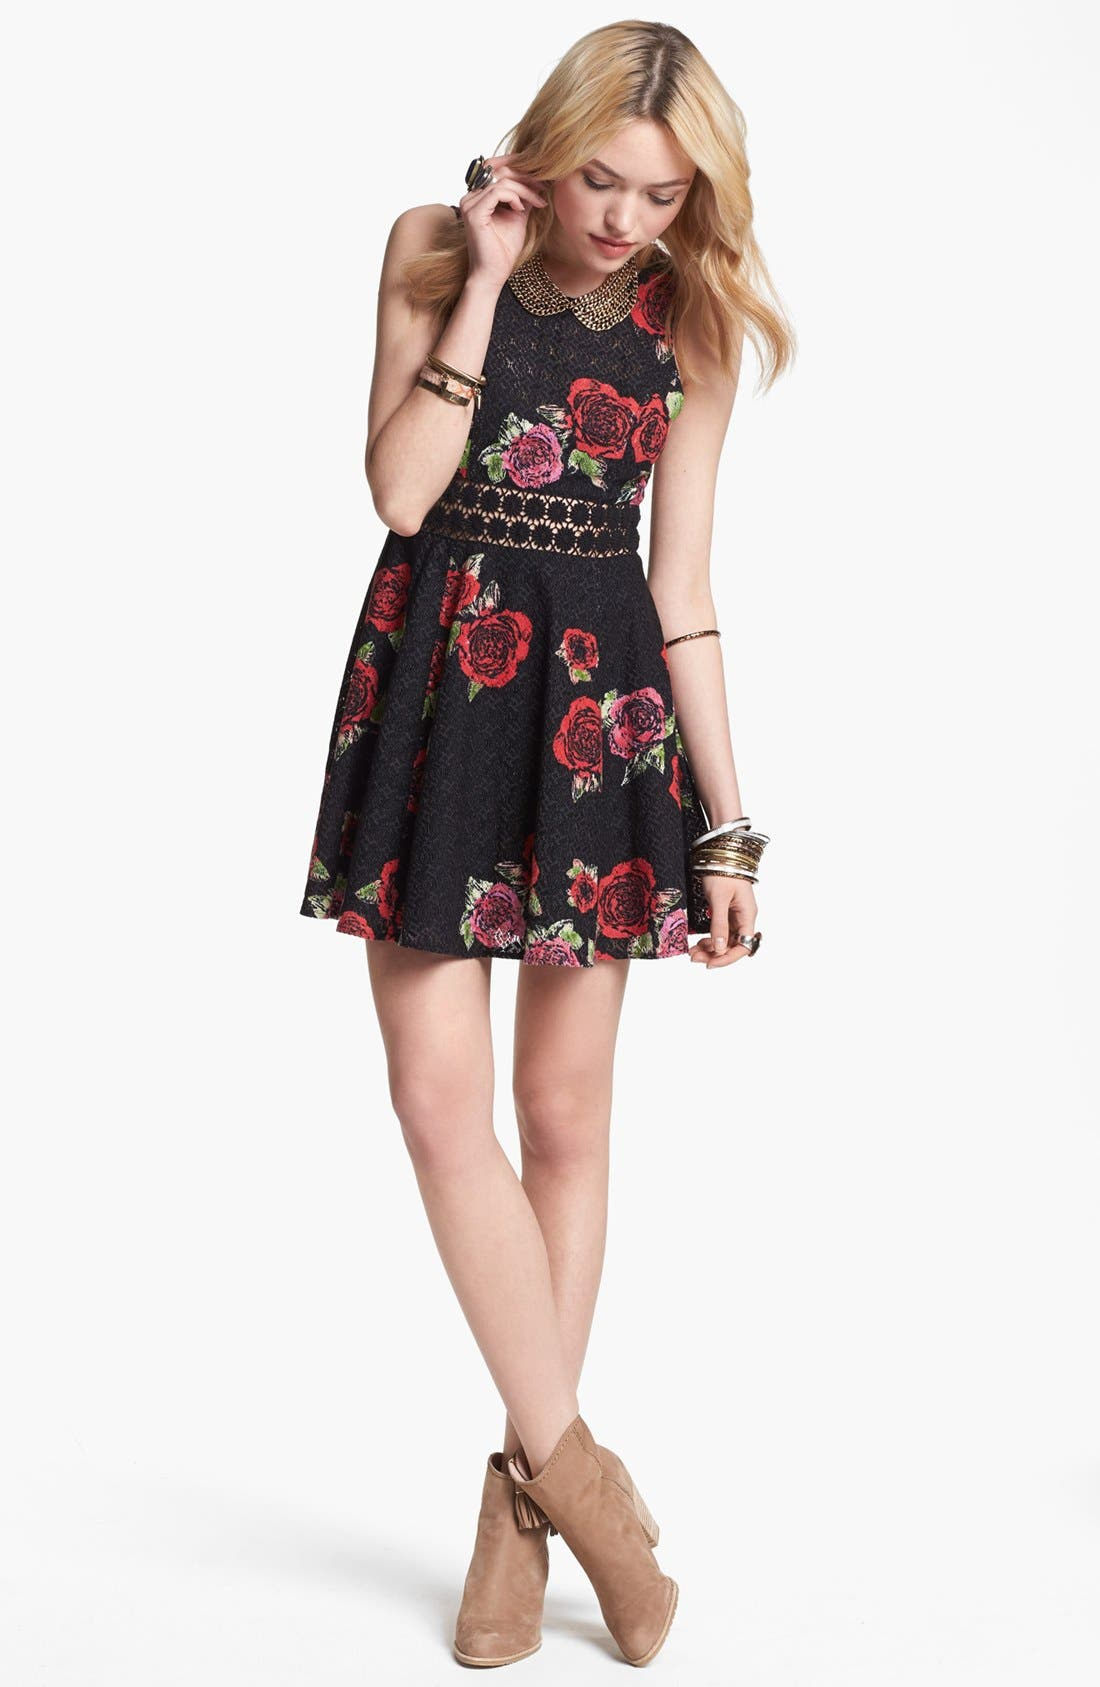 Alternate Image 1 Selected - Free People Floral Print Dress